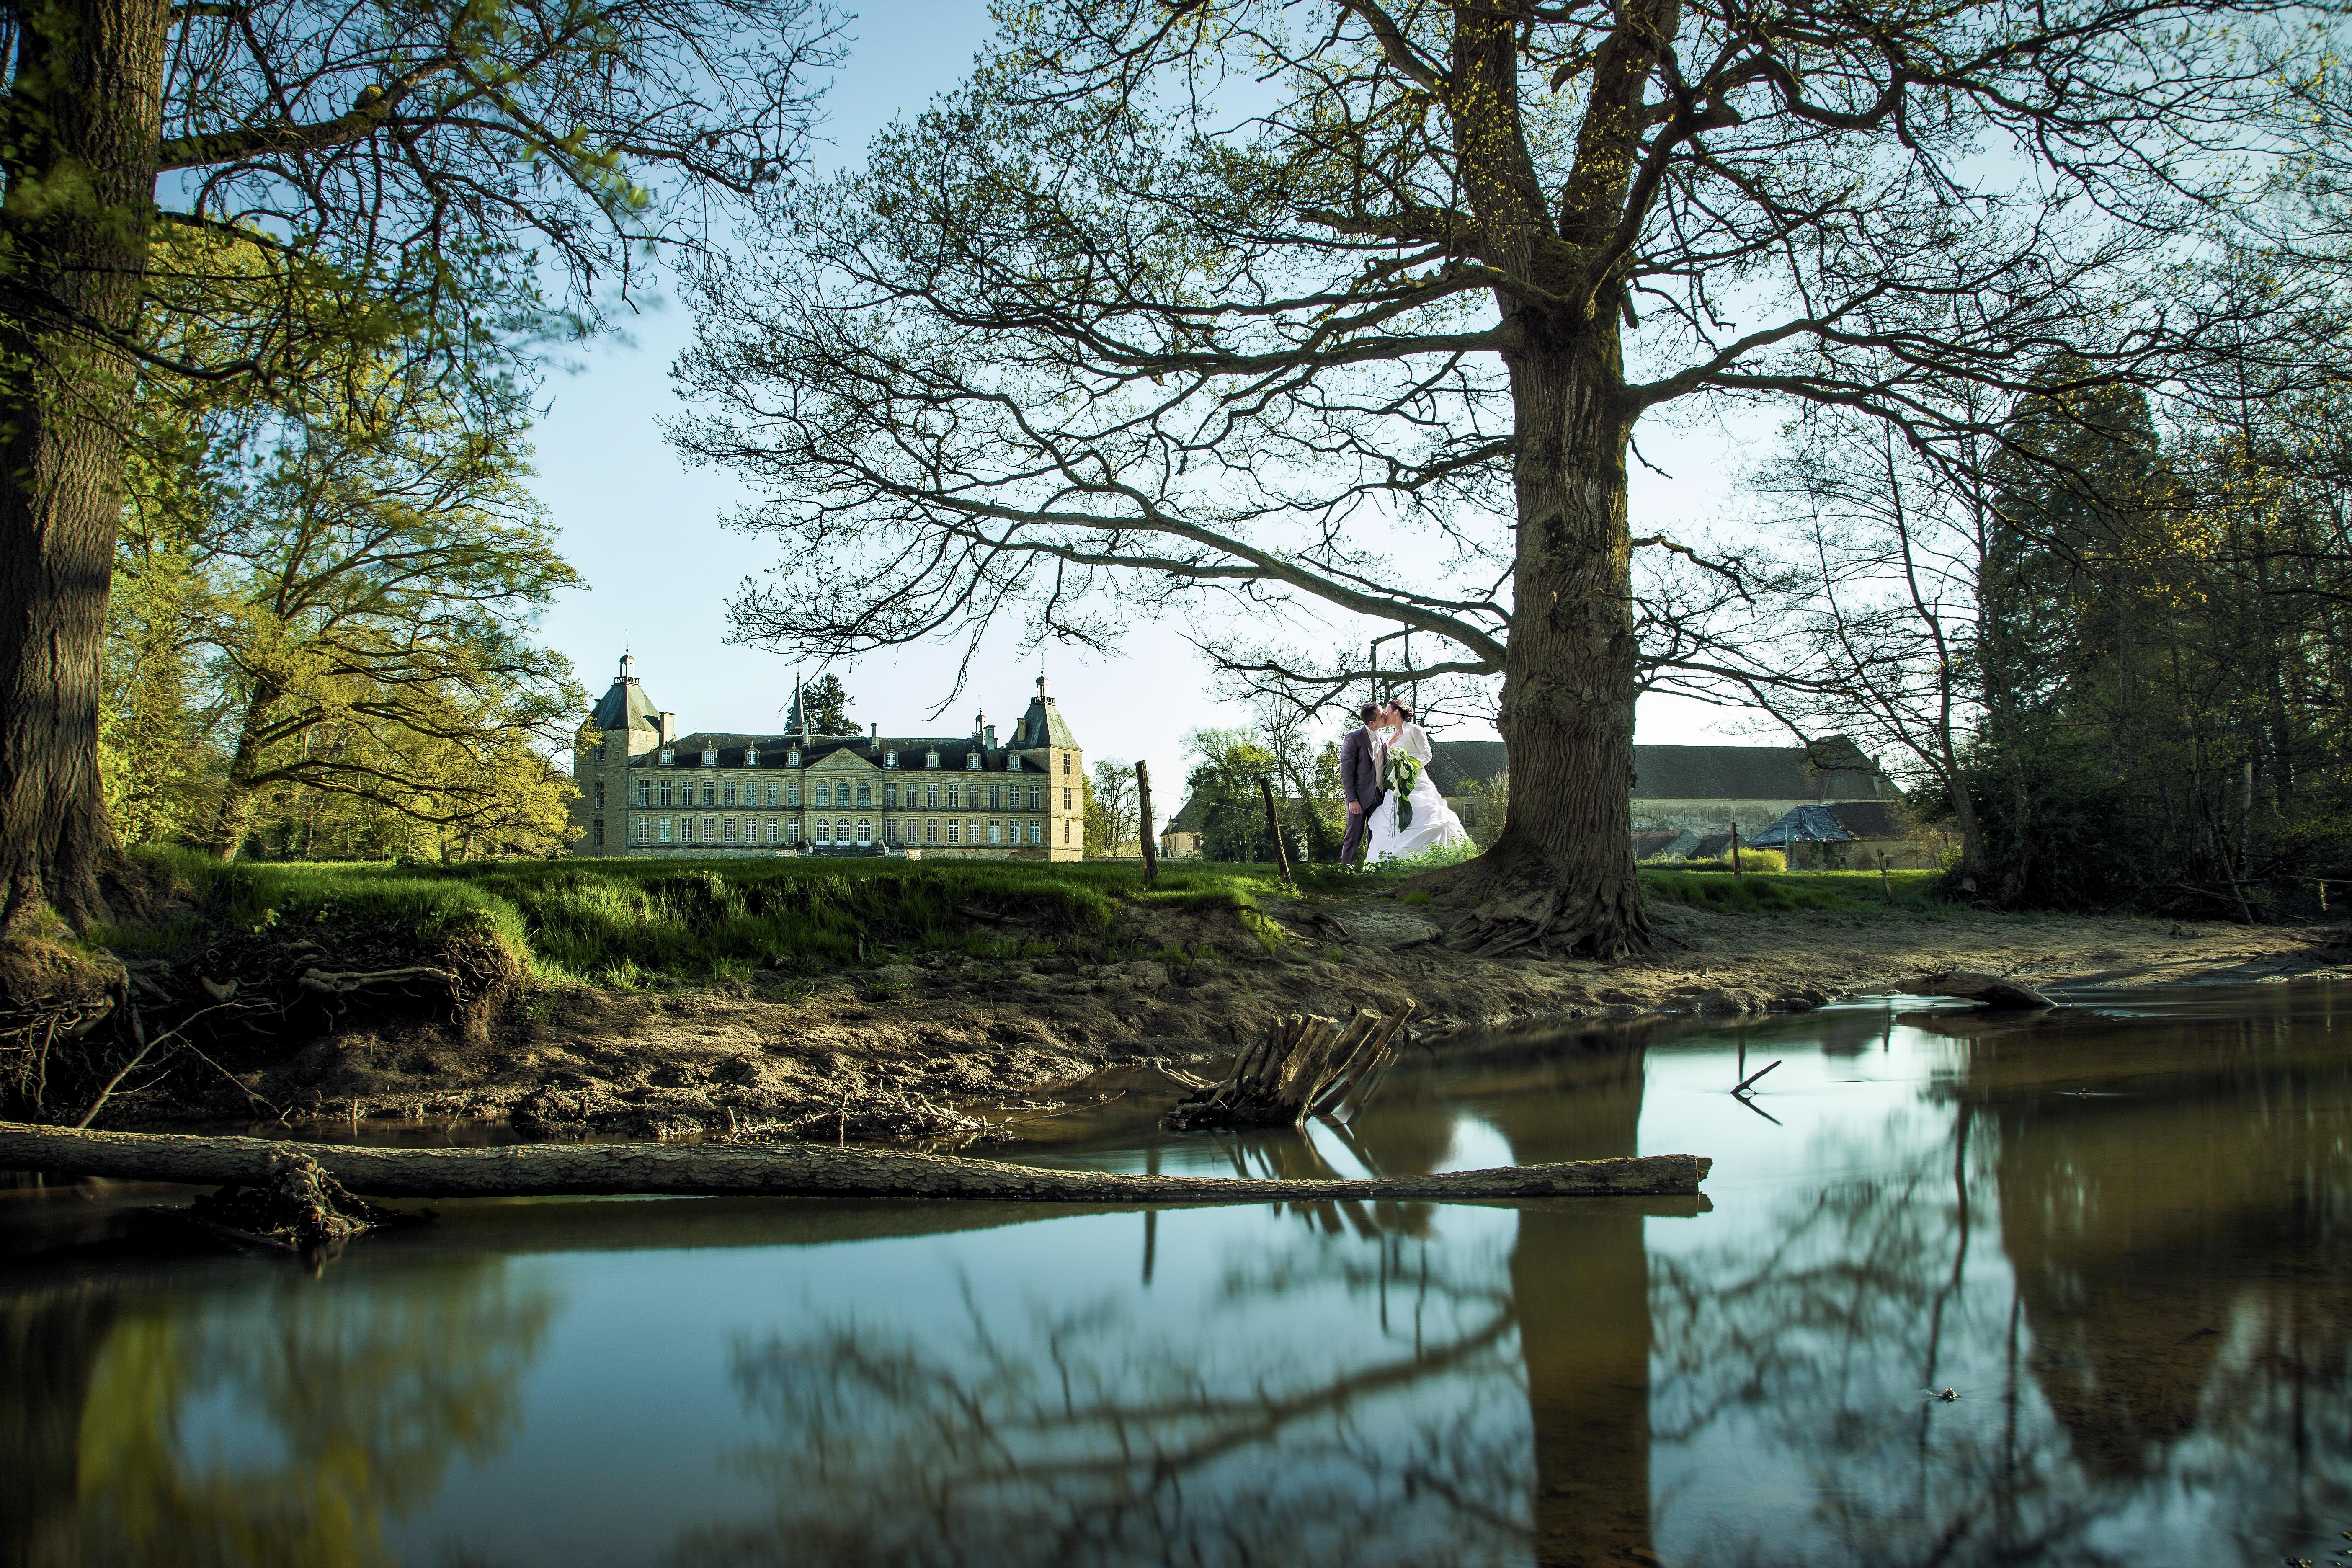 bisceglia pascal photographe autun bourgogne mariage chteau de sully 71 - Chateau De Sully Mariage